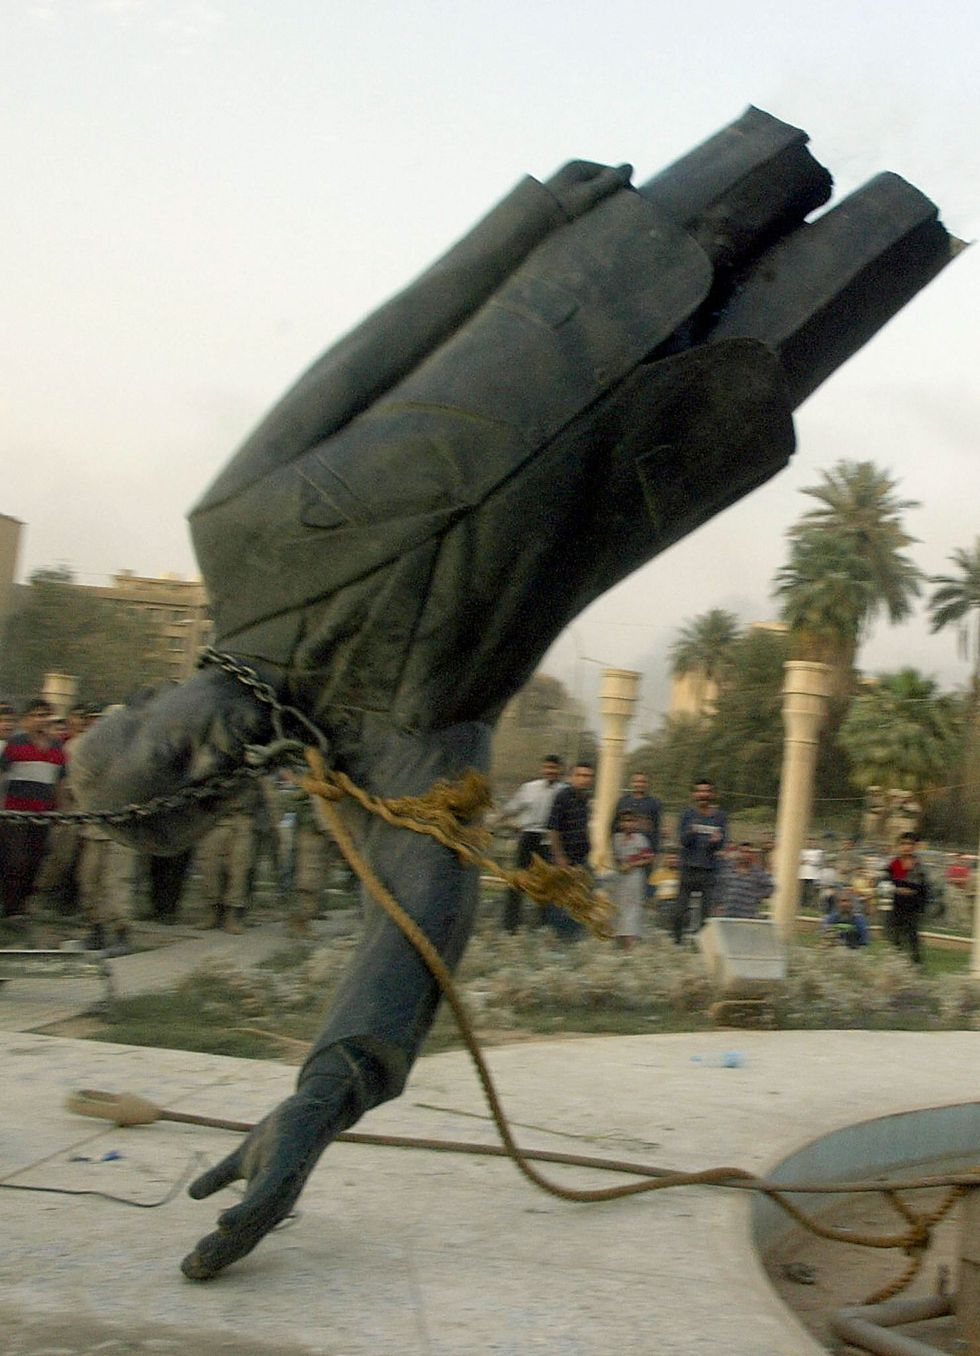 El derrumbe de la estatua de Saddam Hussein en Irak el 9 de abril del 2003. Foto: AFP